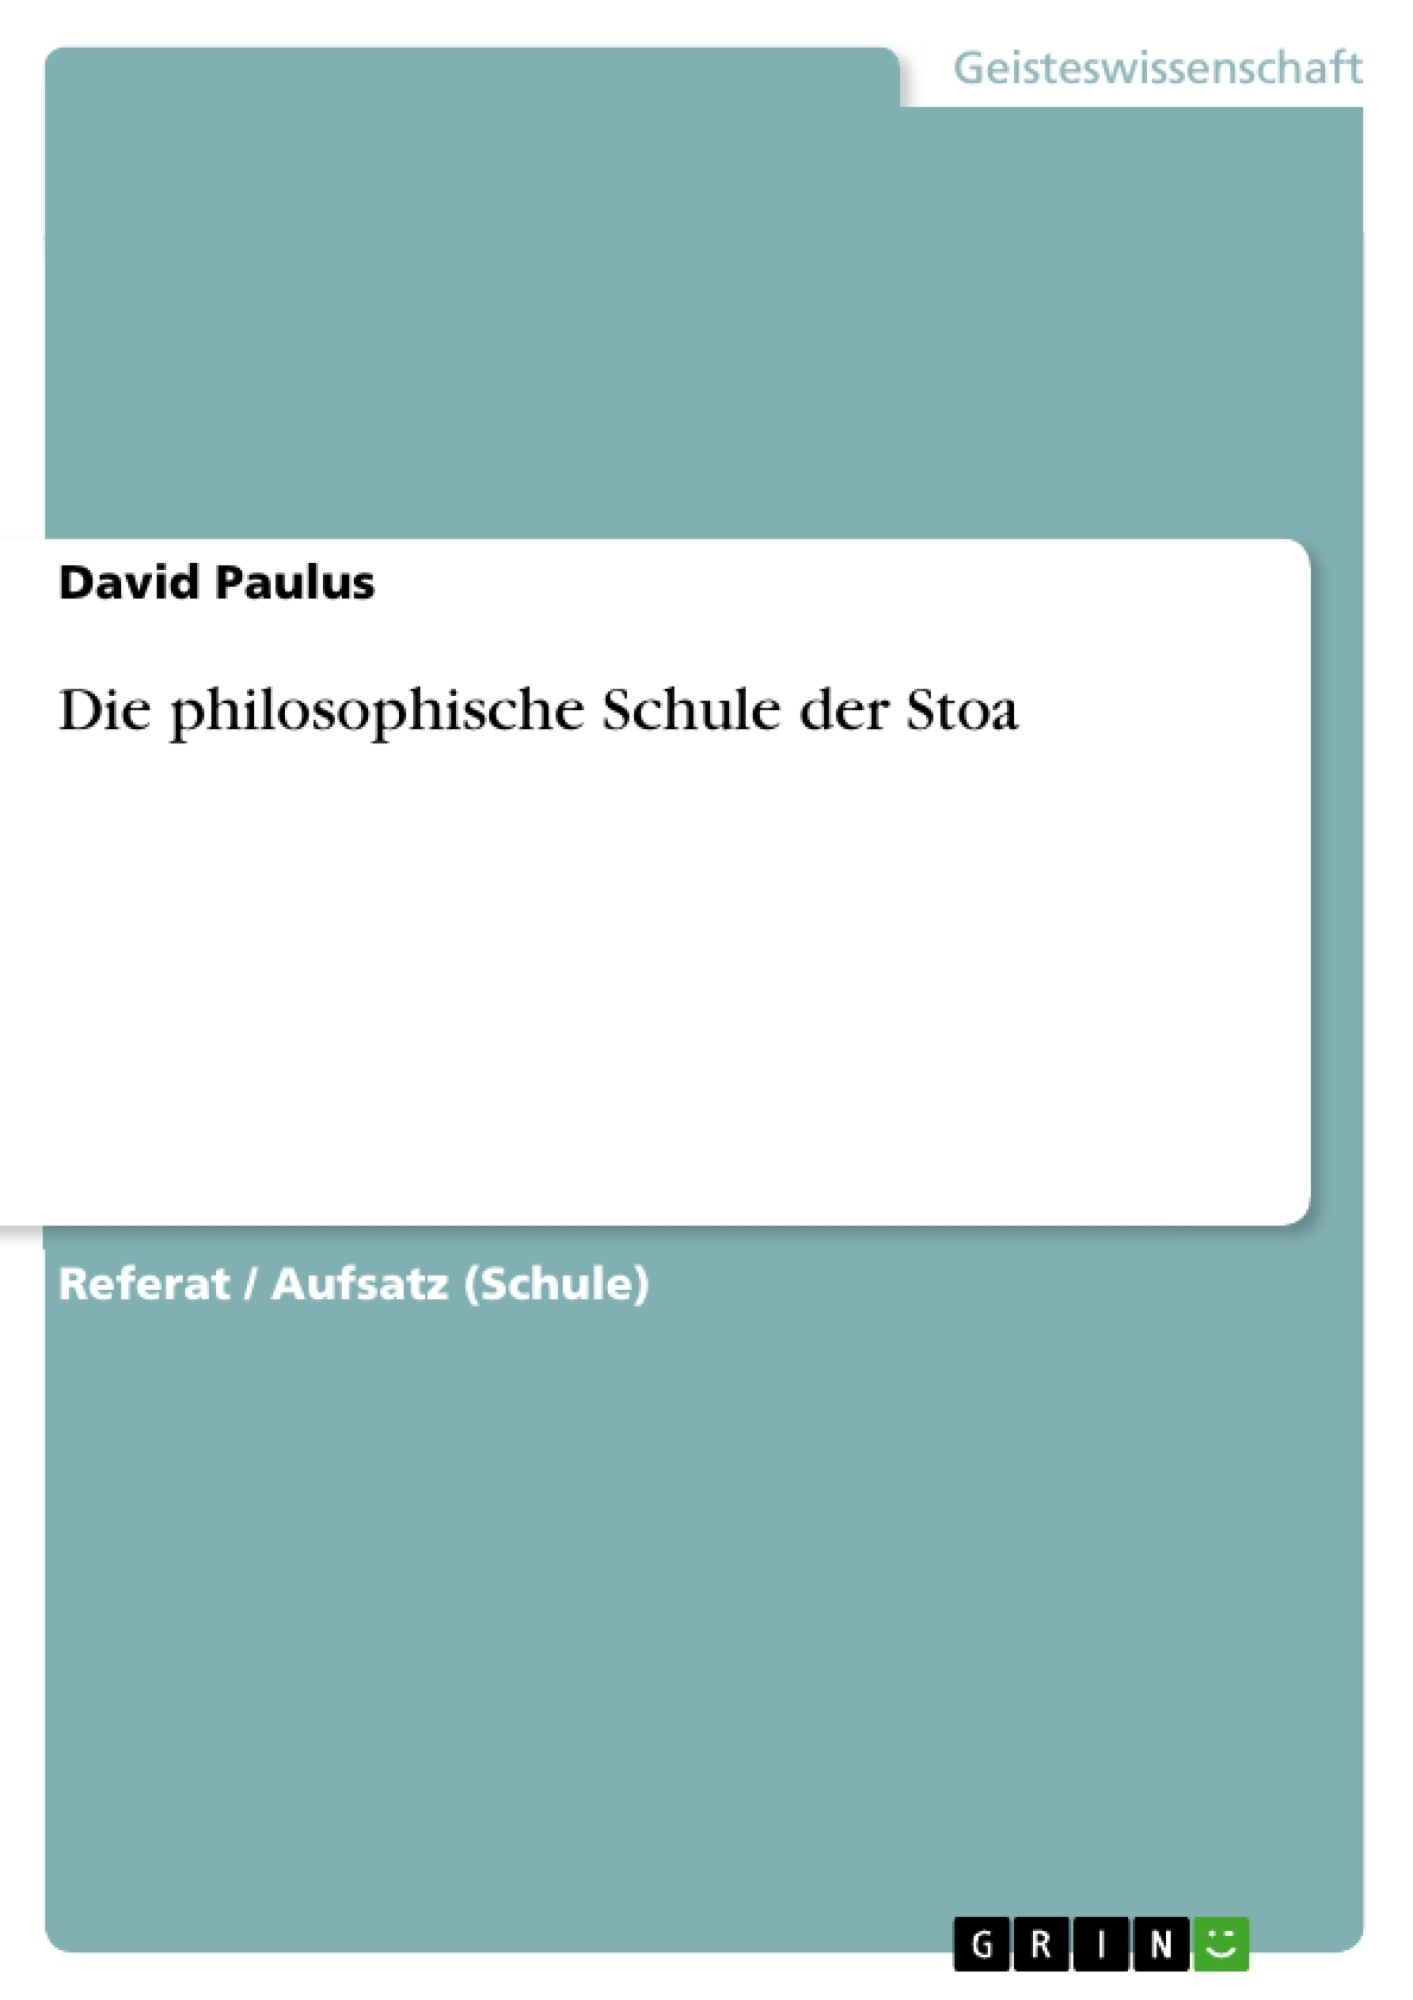 Titel: Die philosophische Schule der Stoa